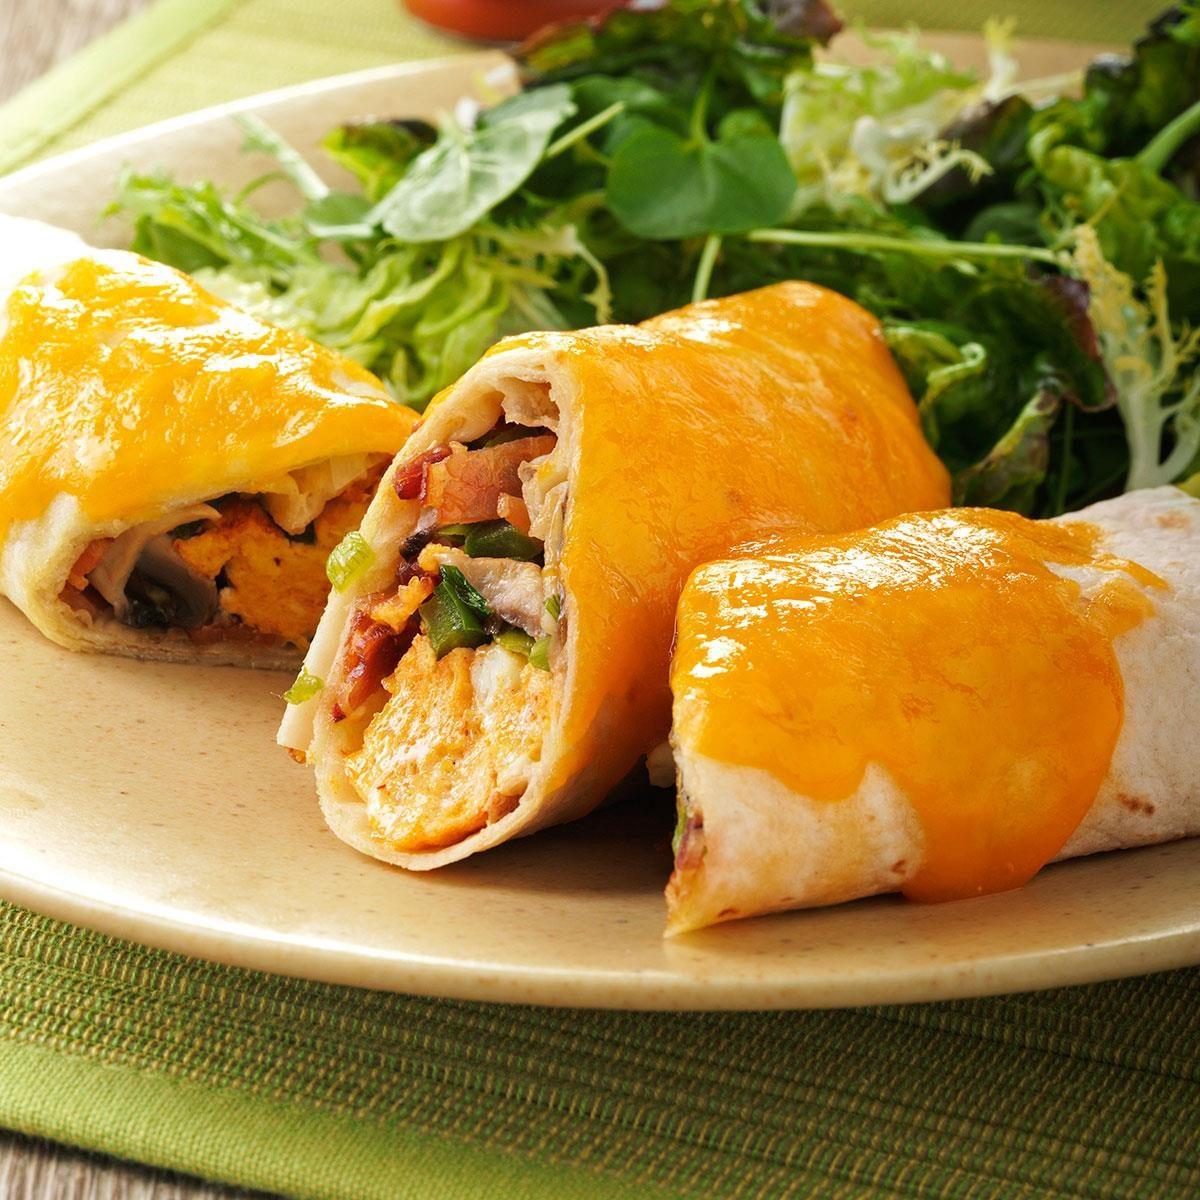 Baked Breakfast: Baked Breakfast Burritos Recipe